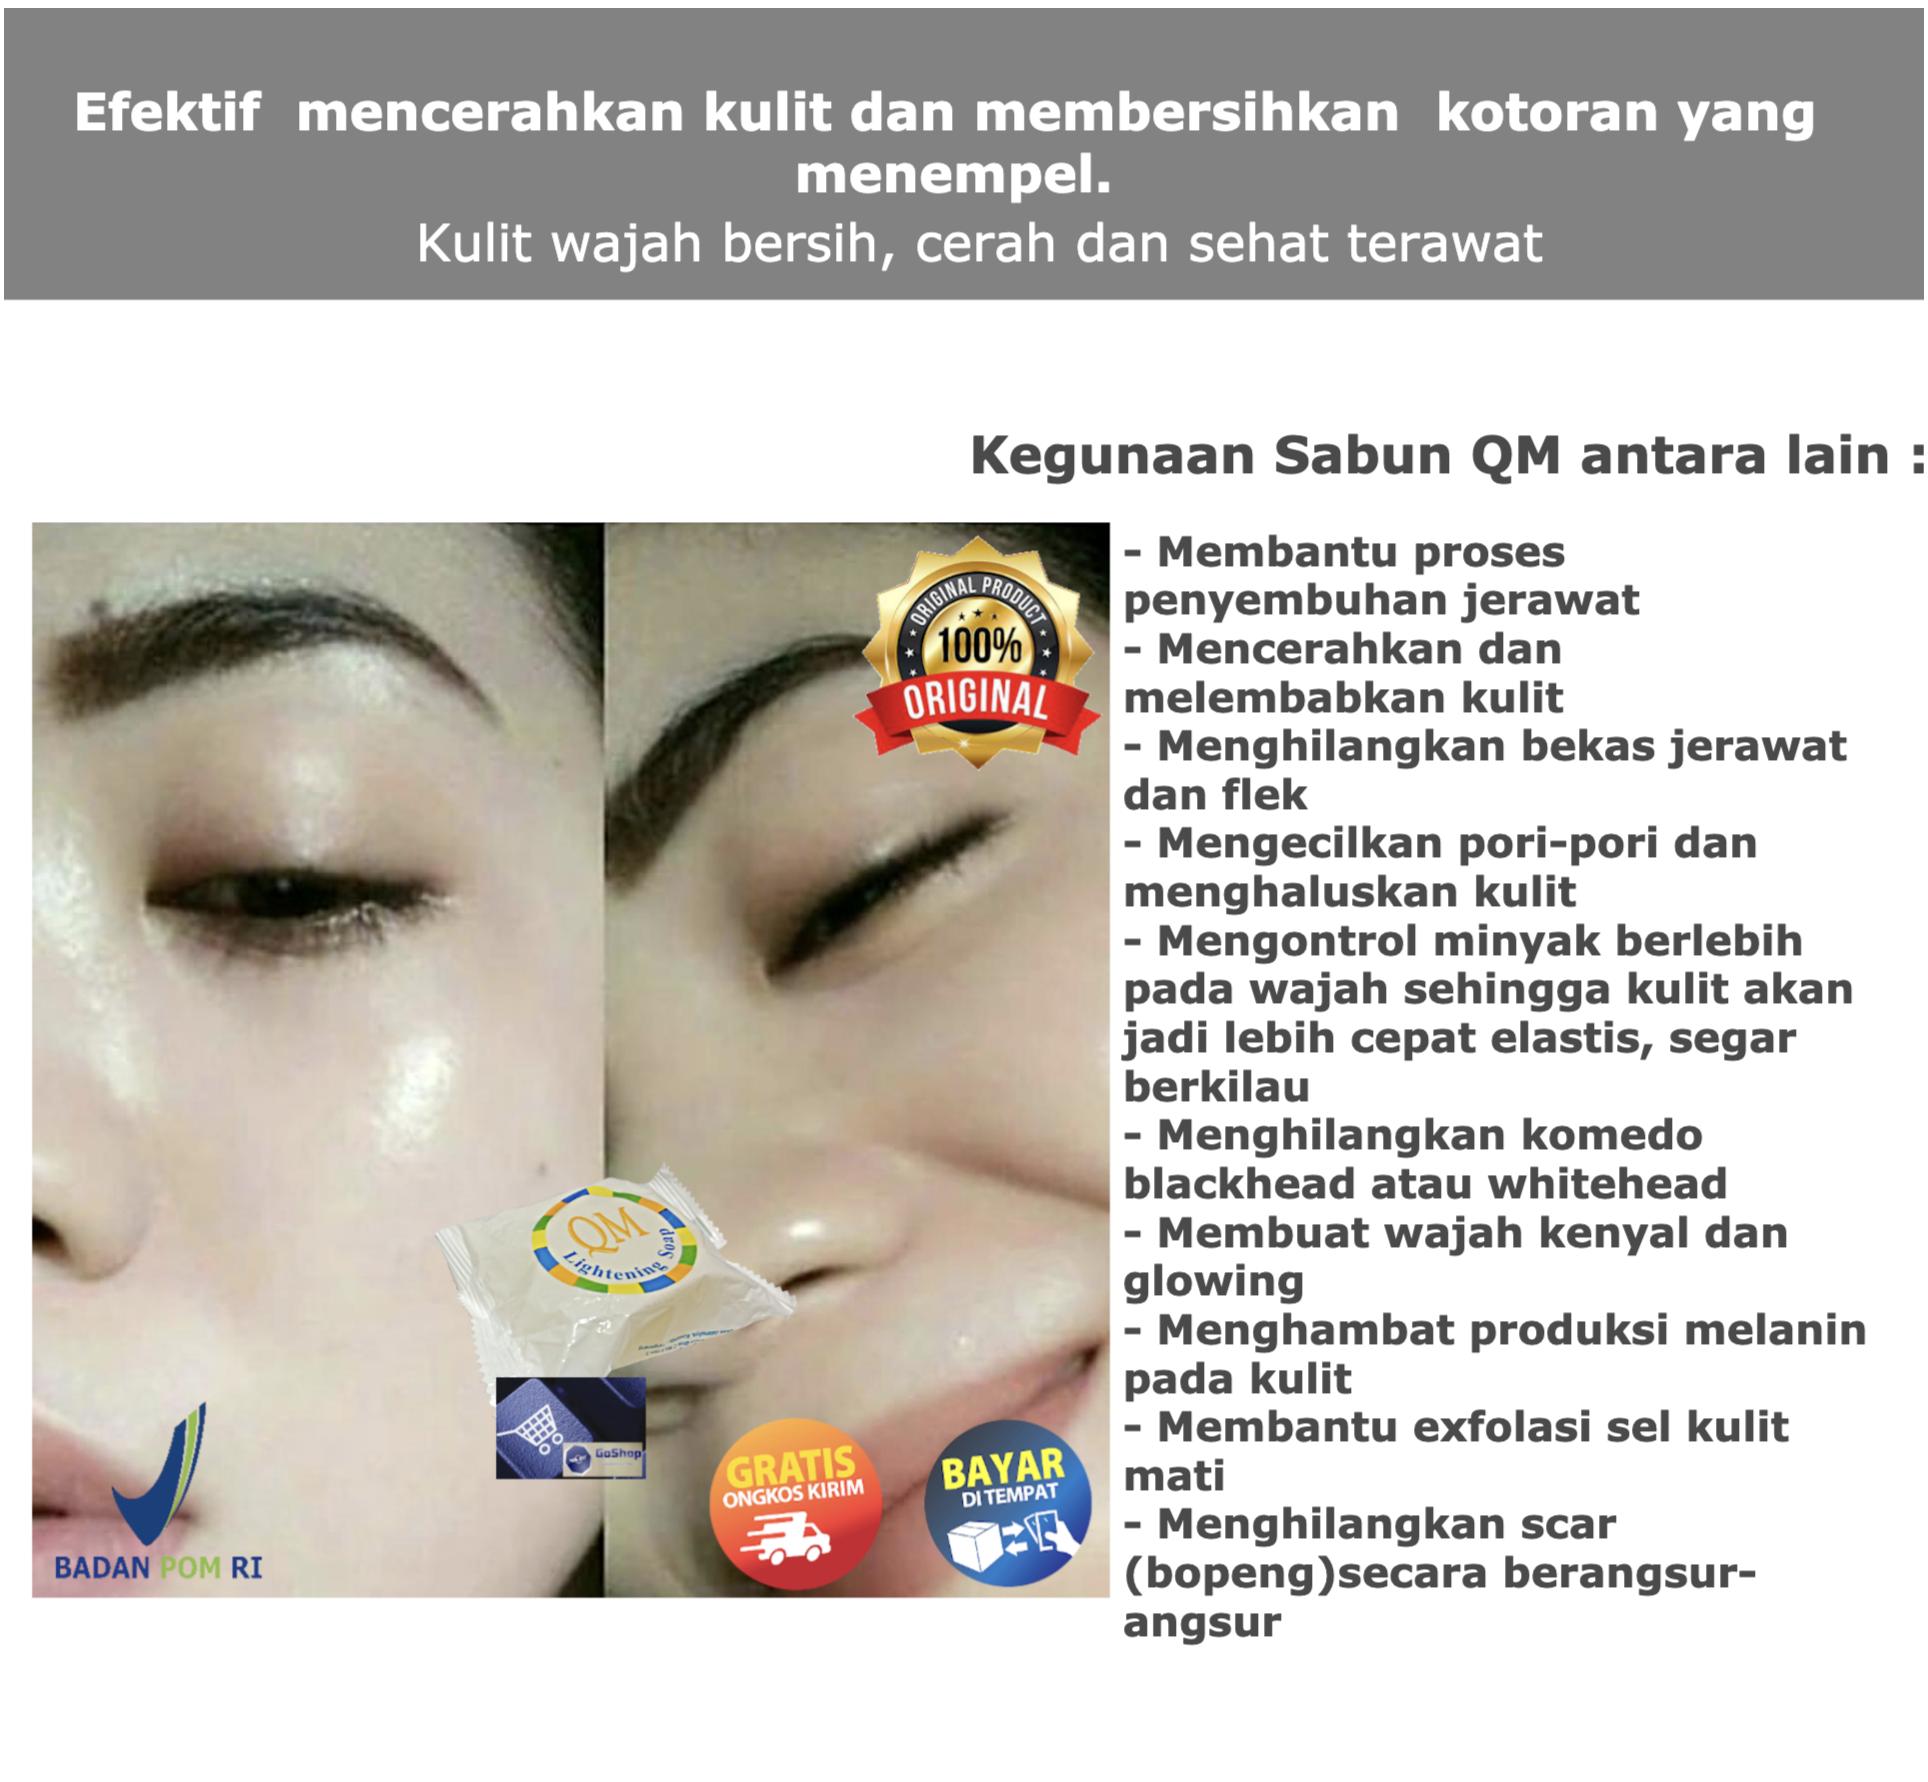 Hoki Cod 1 Pcs Sabun Qm Sabun Pemutih Wajah Sabun Glowing Pengecil Pori Pori With Arbutin Bpom Dosting Gluta Fruity Fruitamin Susu Domba Ssd Klinskin Lazada Indonesia